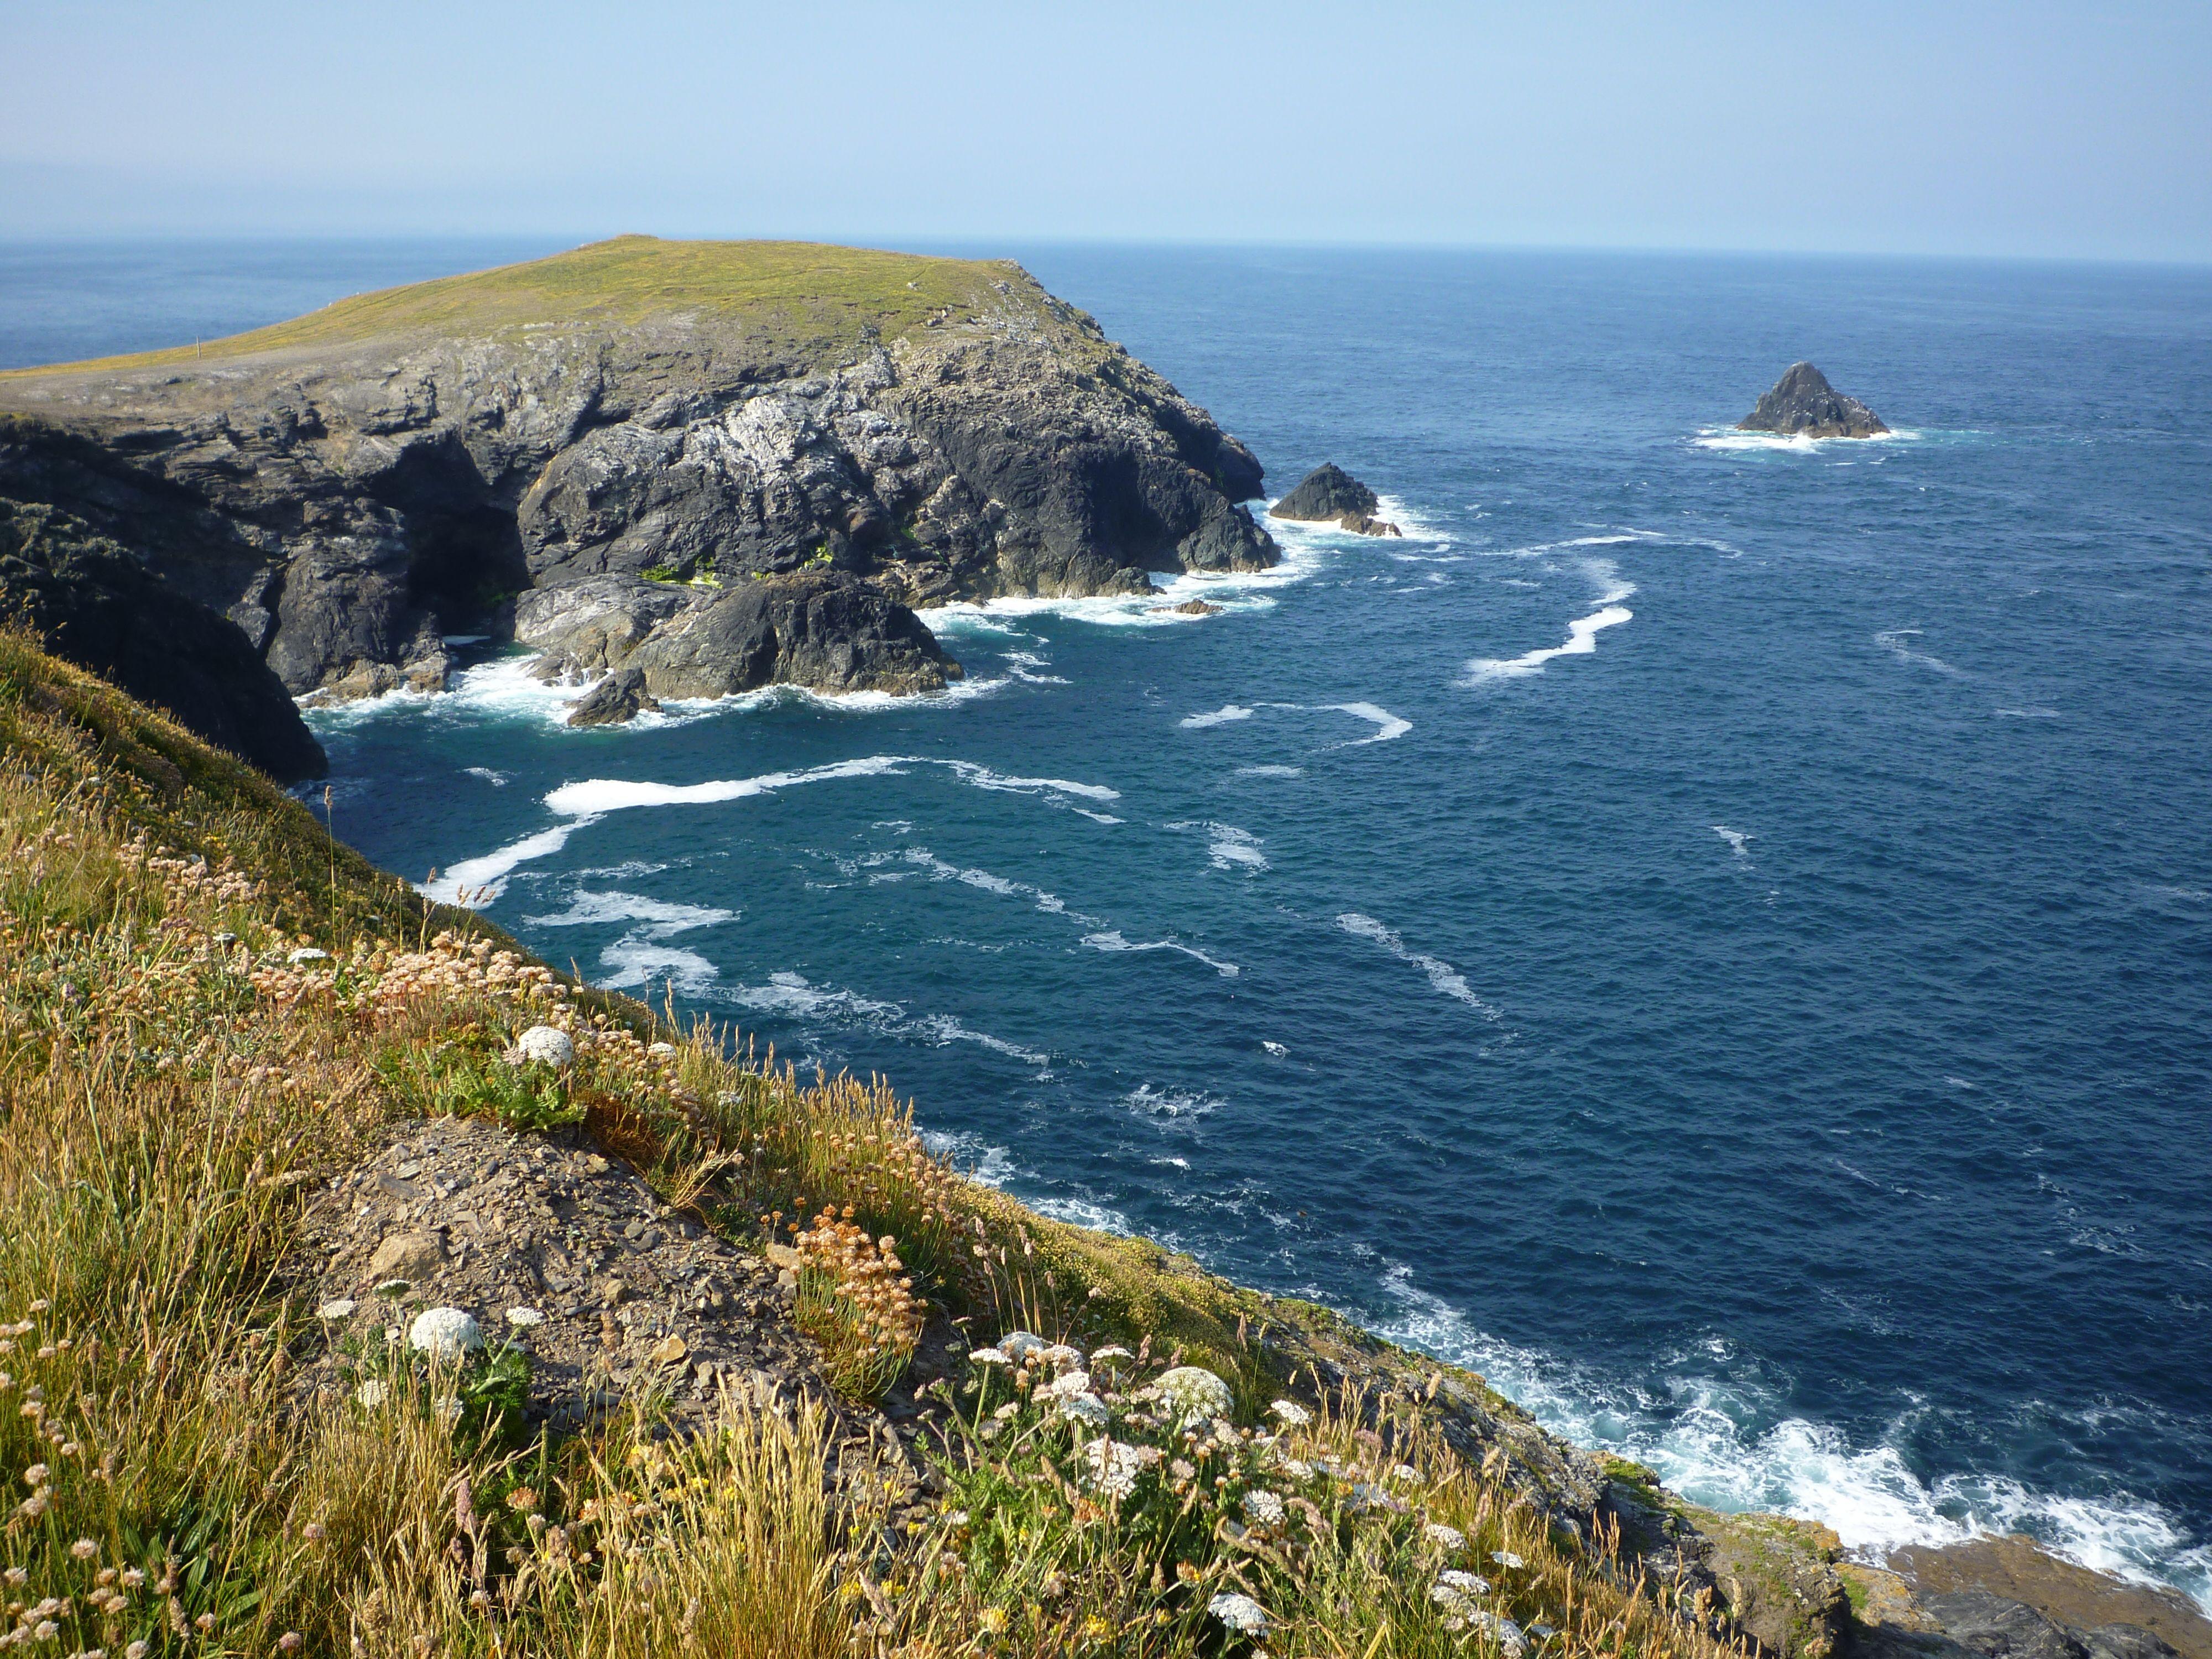 Coastline Pics, CGI Collection